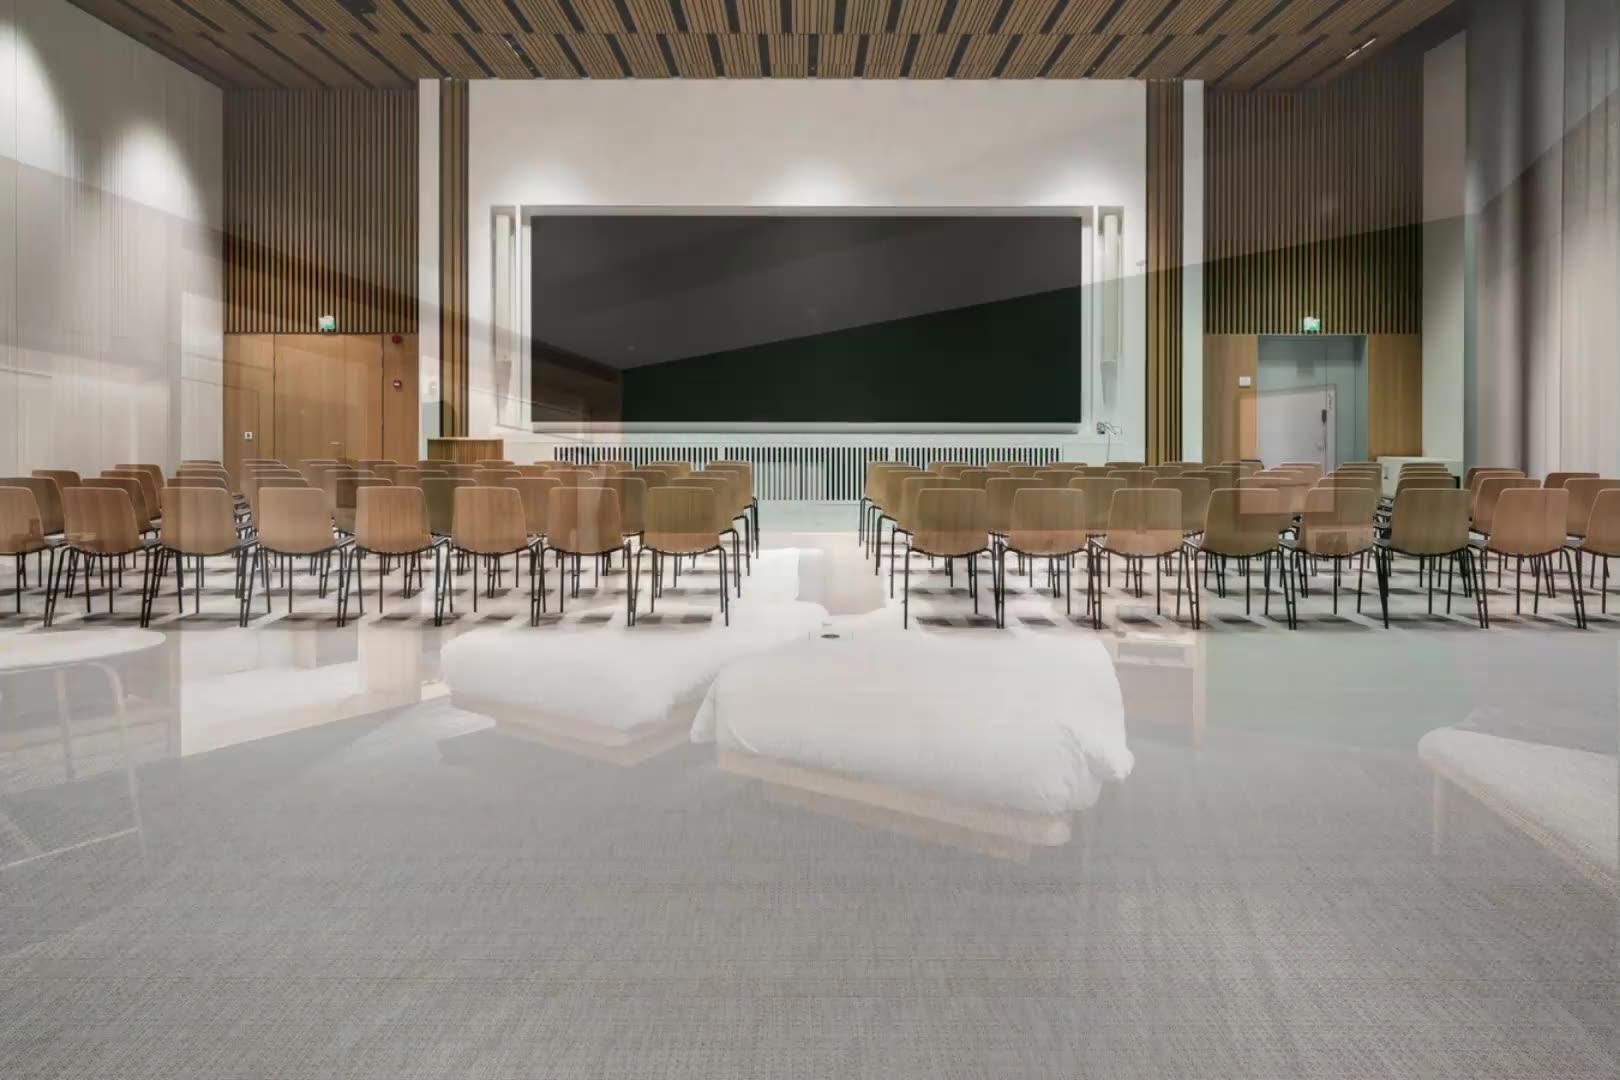 Ostboden 패션 다채로운 짠된 비닐 타일 pvc 비닐 바닥재 piso vinilico 플라스틱 바닥 오피스 호텔 실내 사용